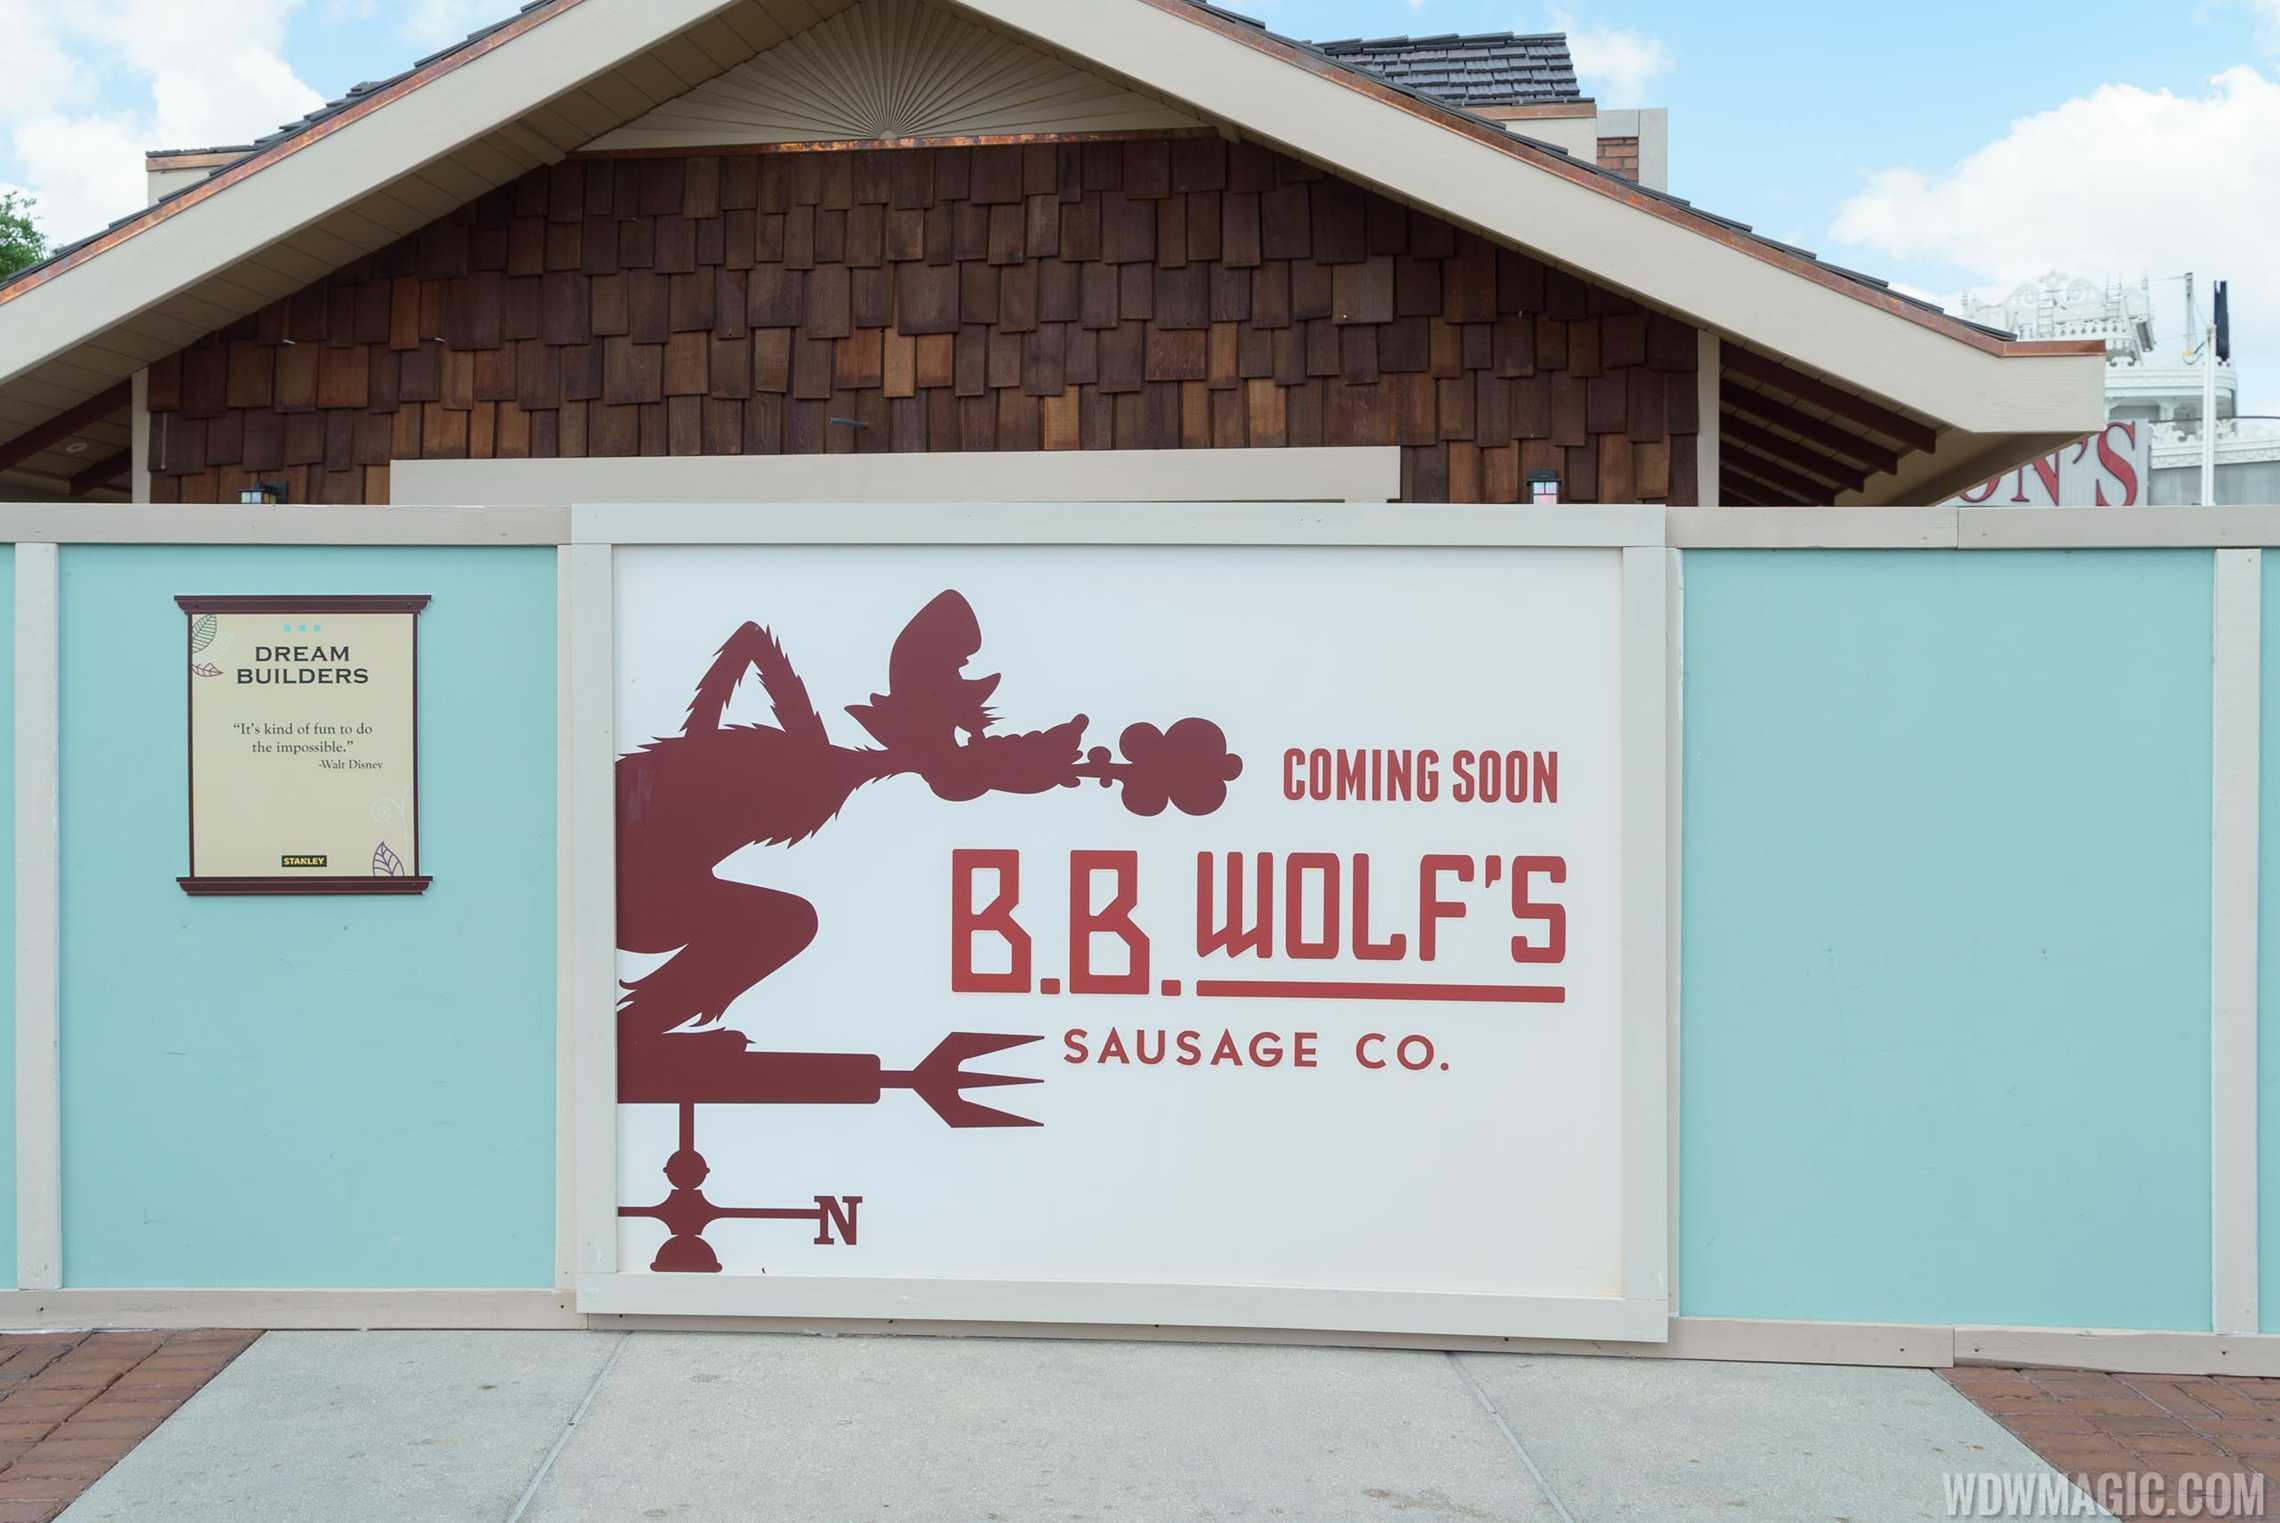 B.B. Wolf's Sausage Co sign